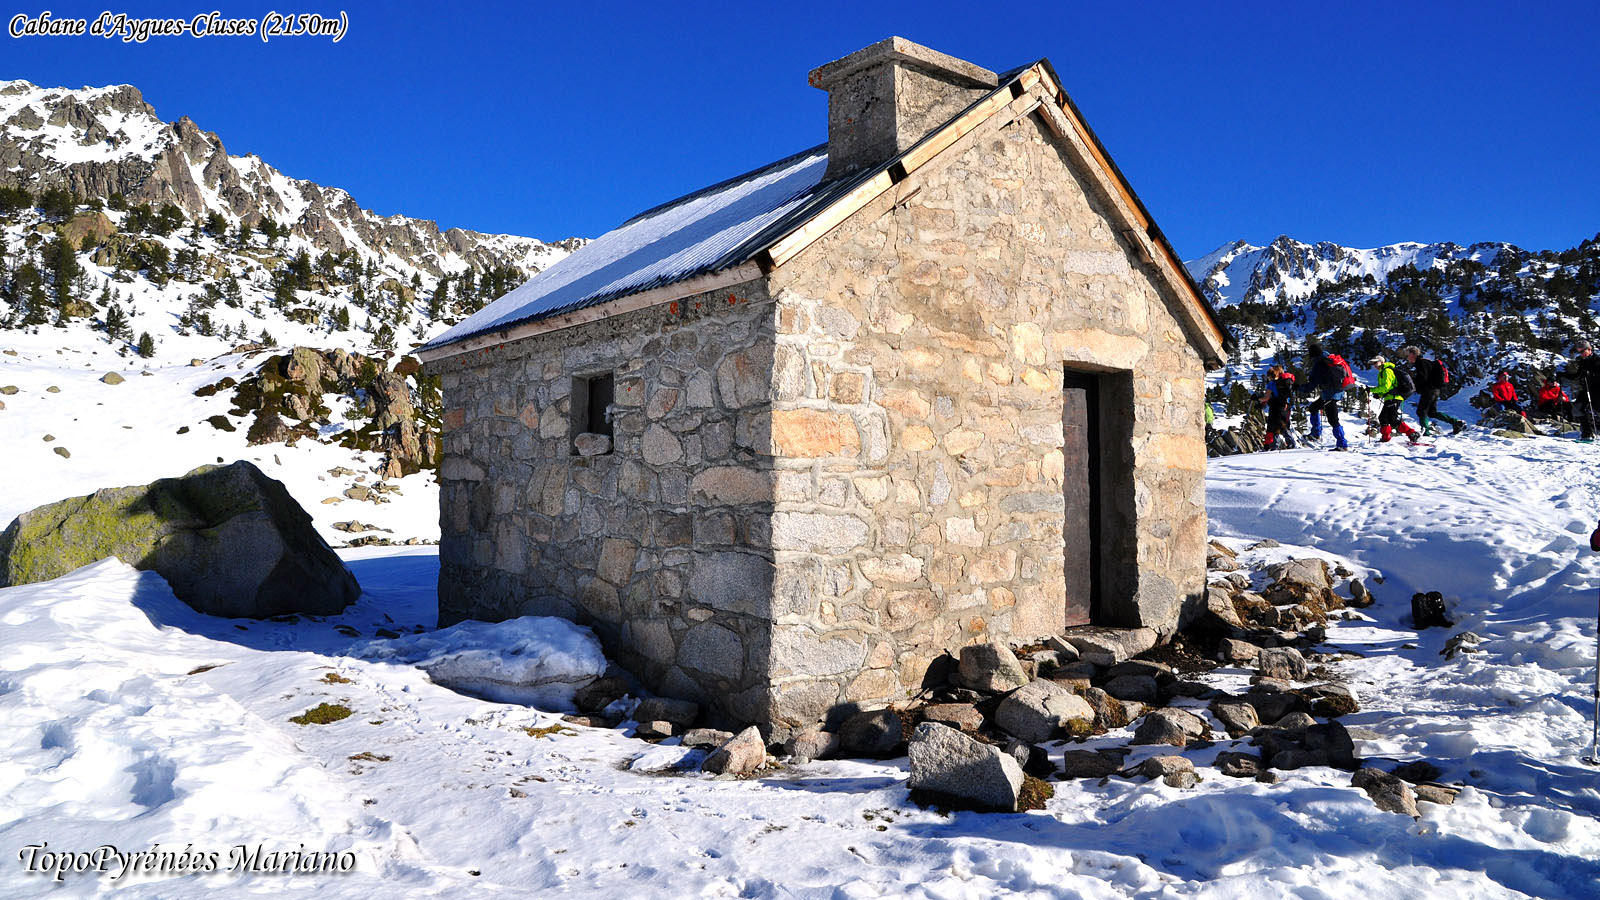 Raquettes cabane d'Aygues-Cluses (2150m)